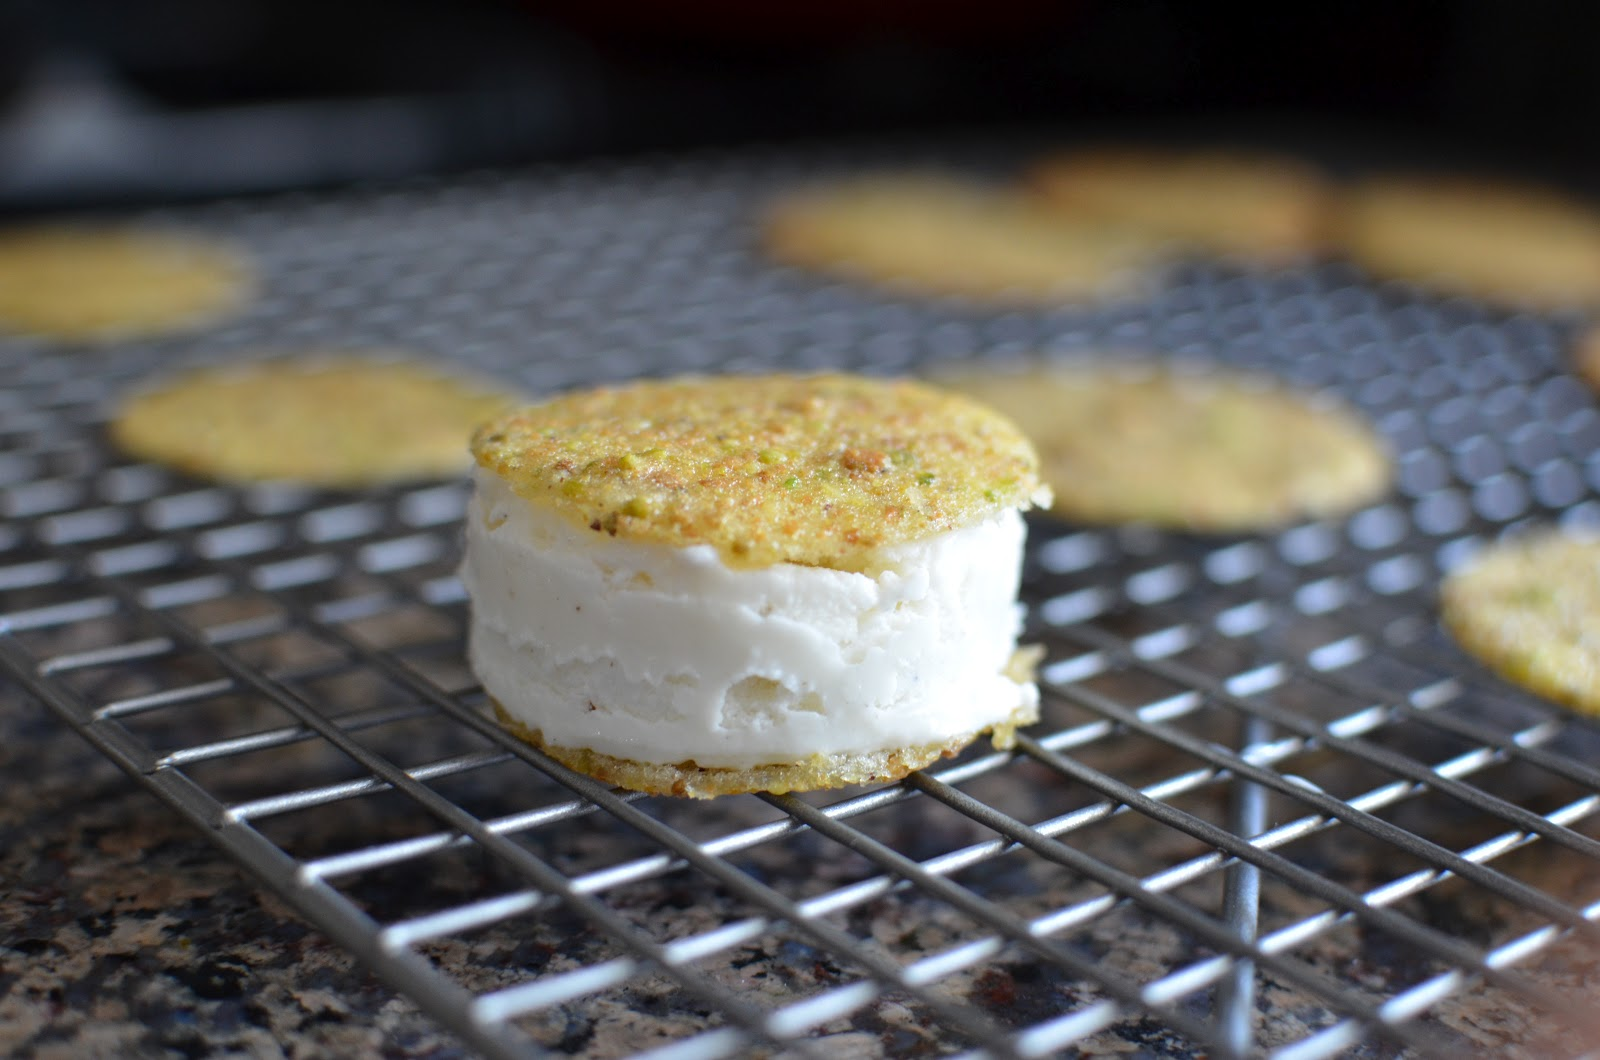 Pistachio tuile ice cream sandwiches